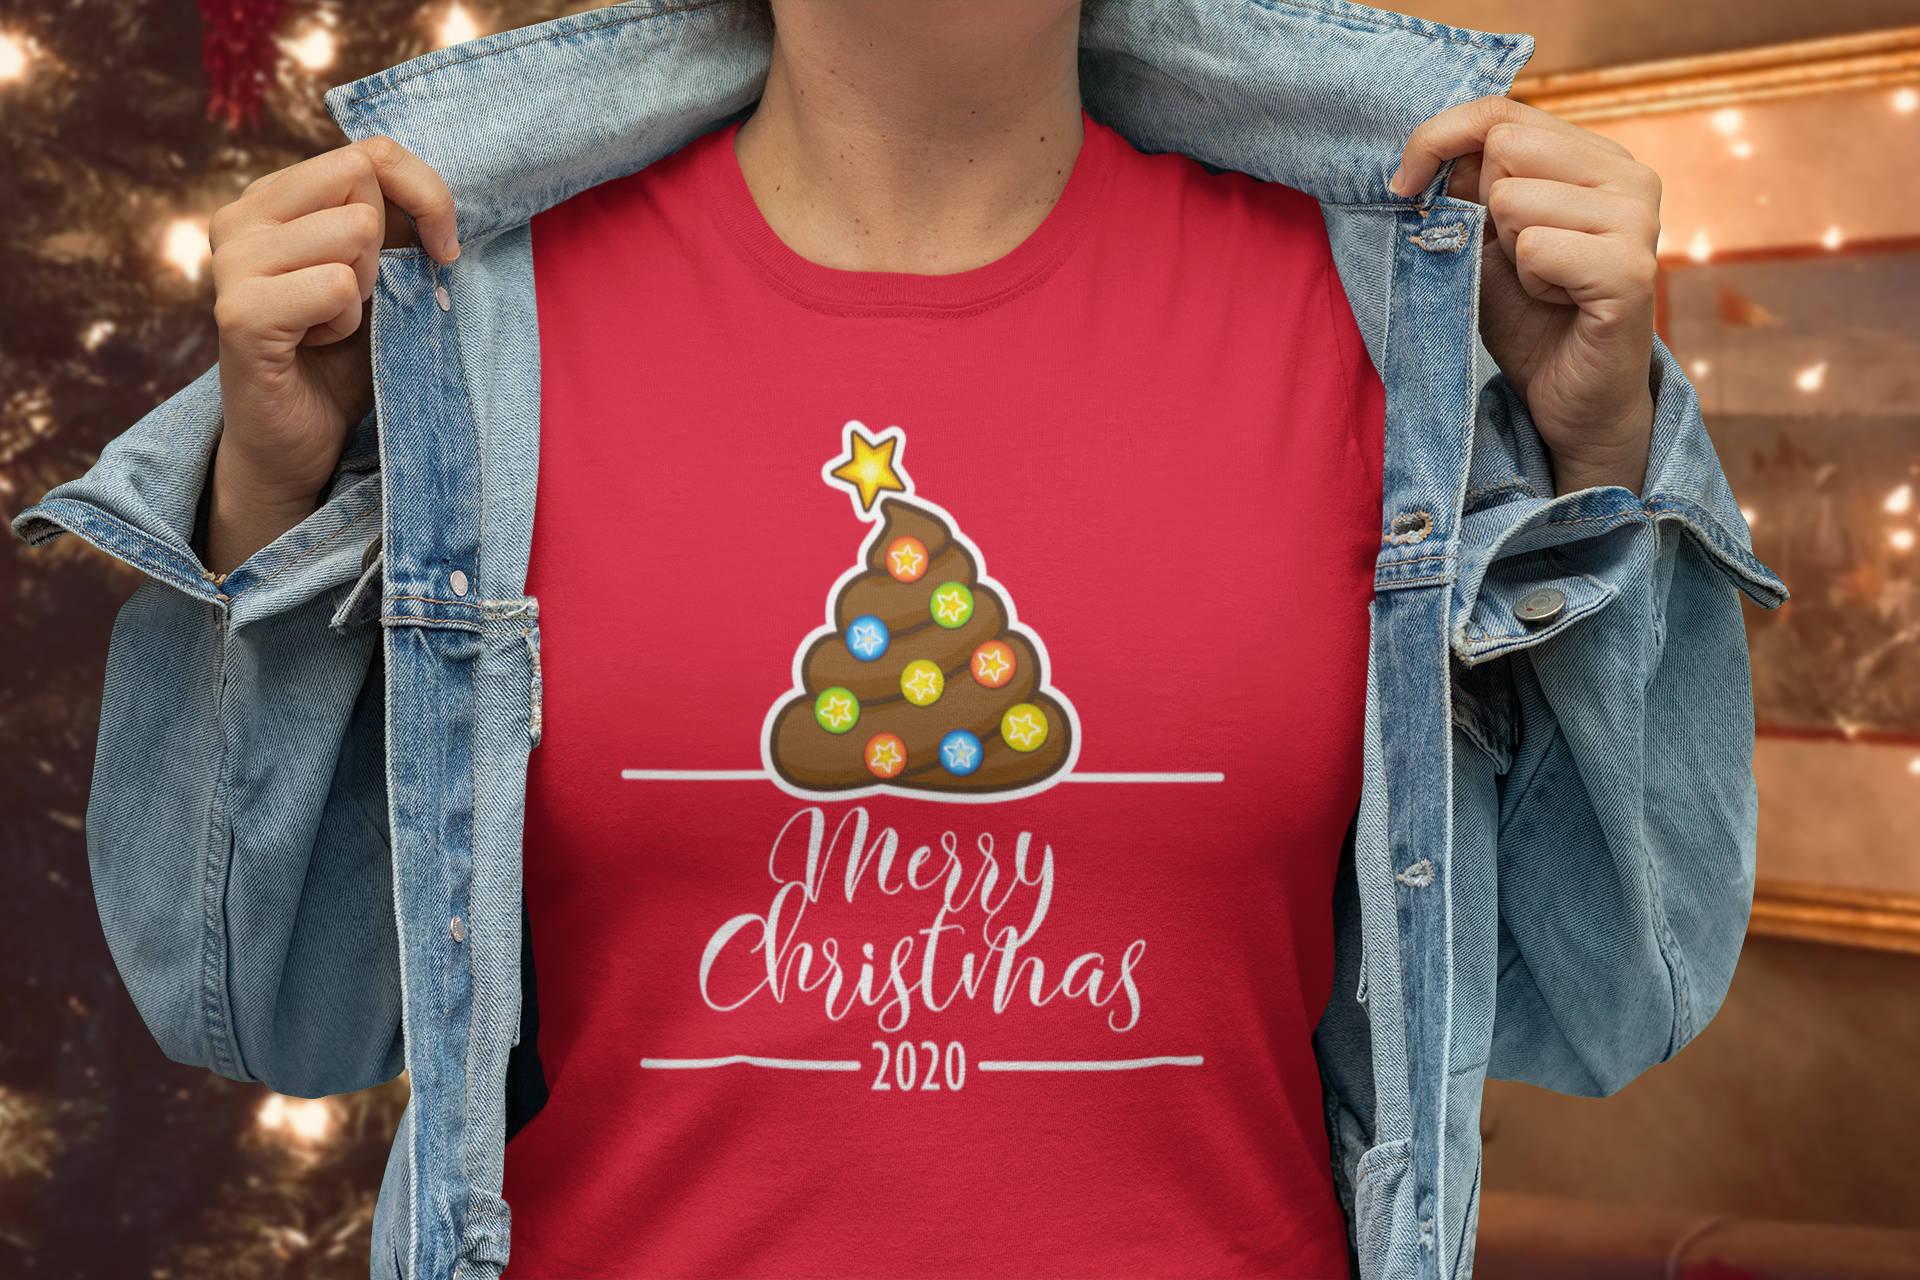 Christmas 2020 poop emoji tree t-shirt on model